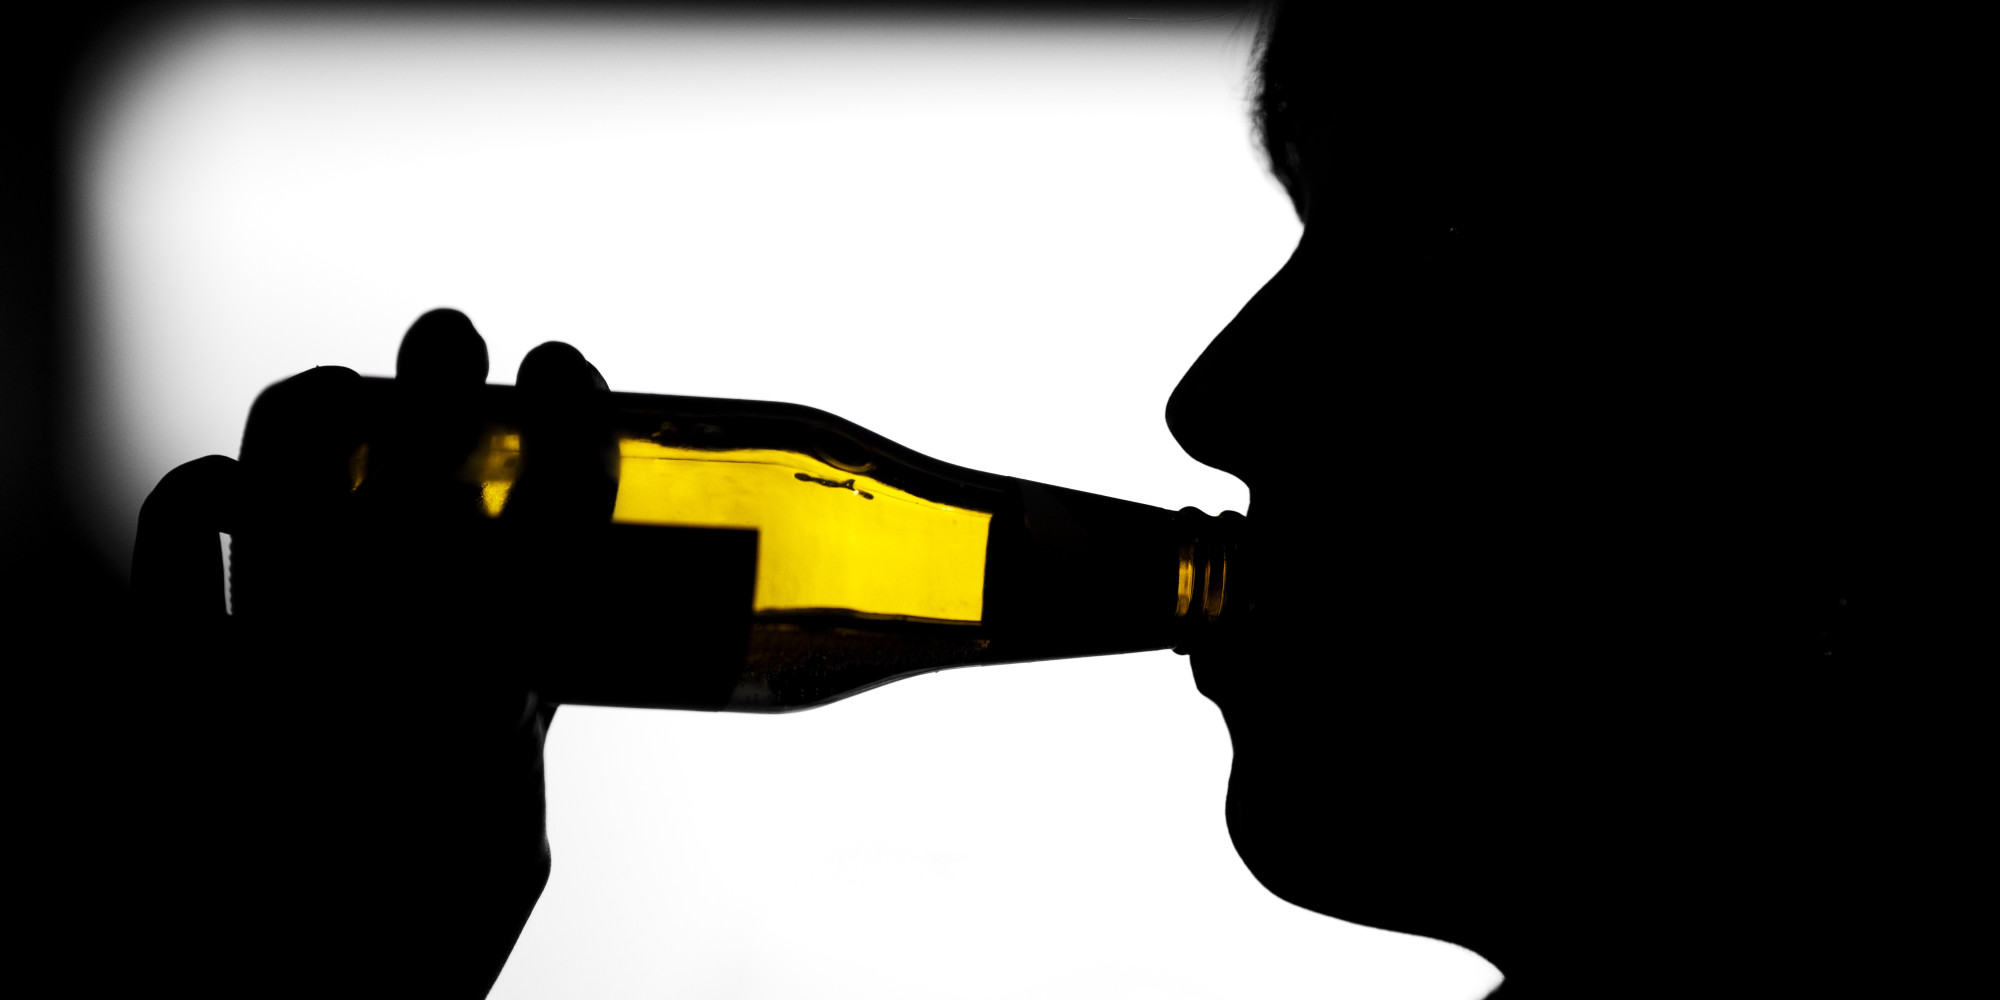 disulfiram antabuse alcohol abuse